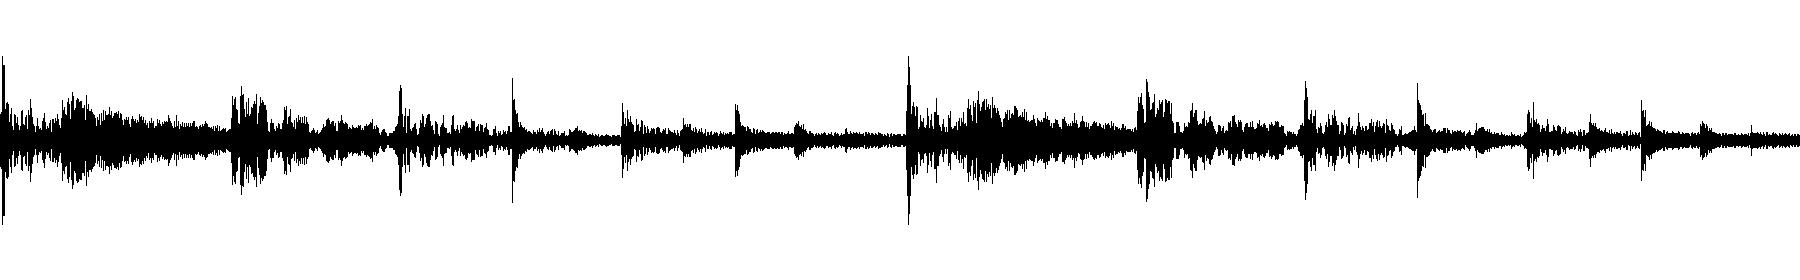 blbc jazzydrums 95 01